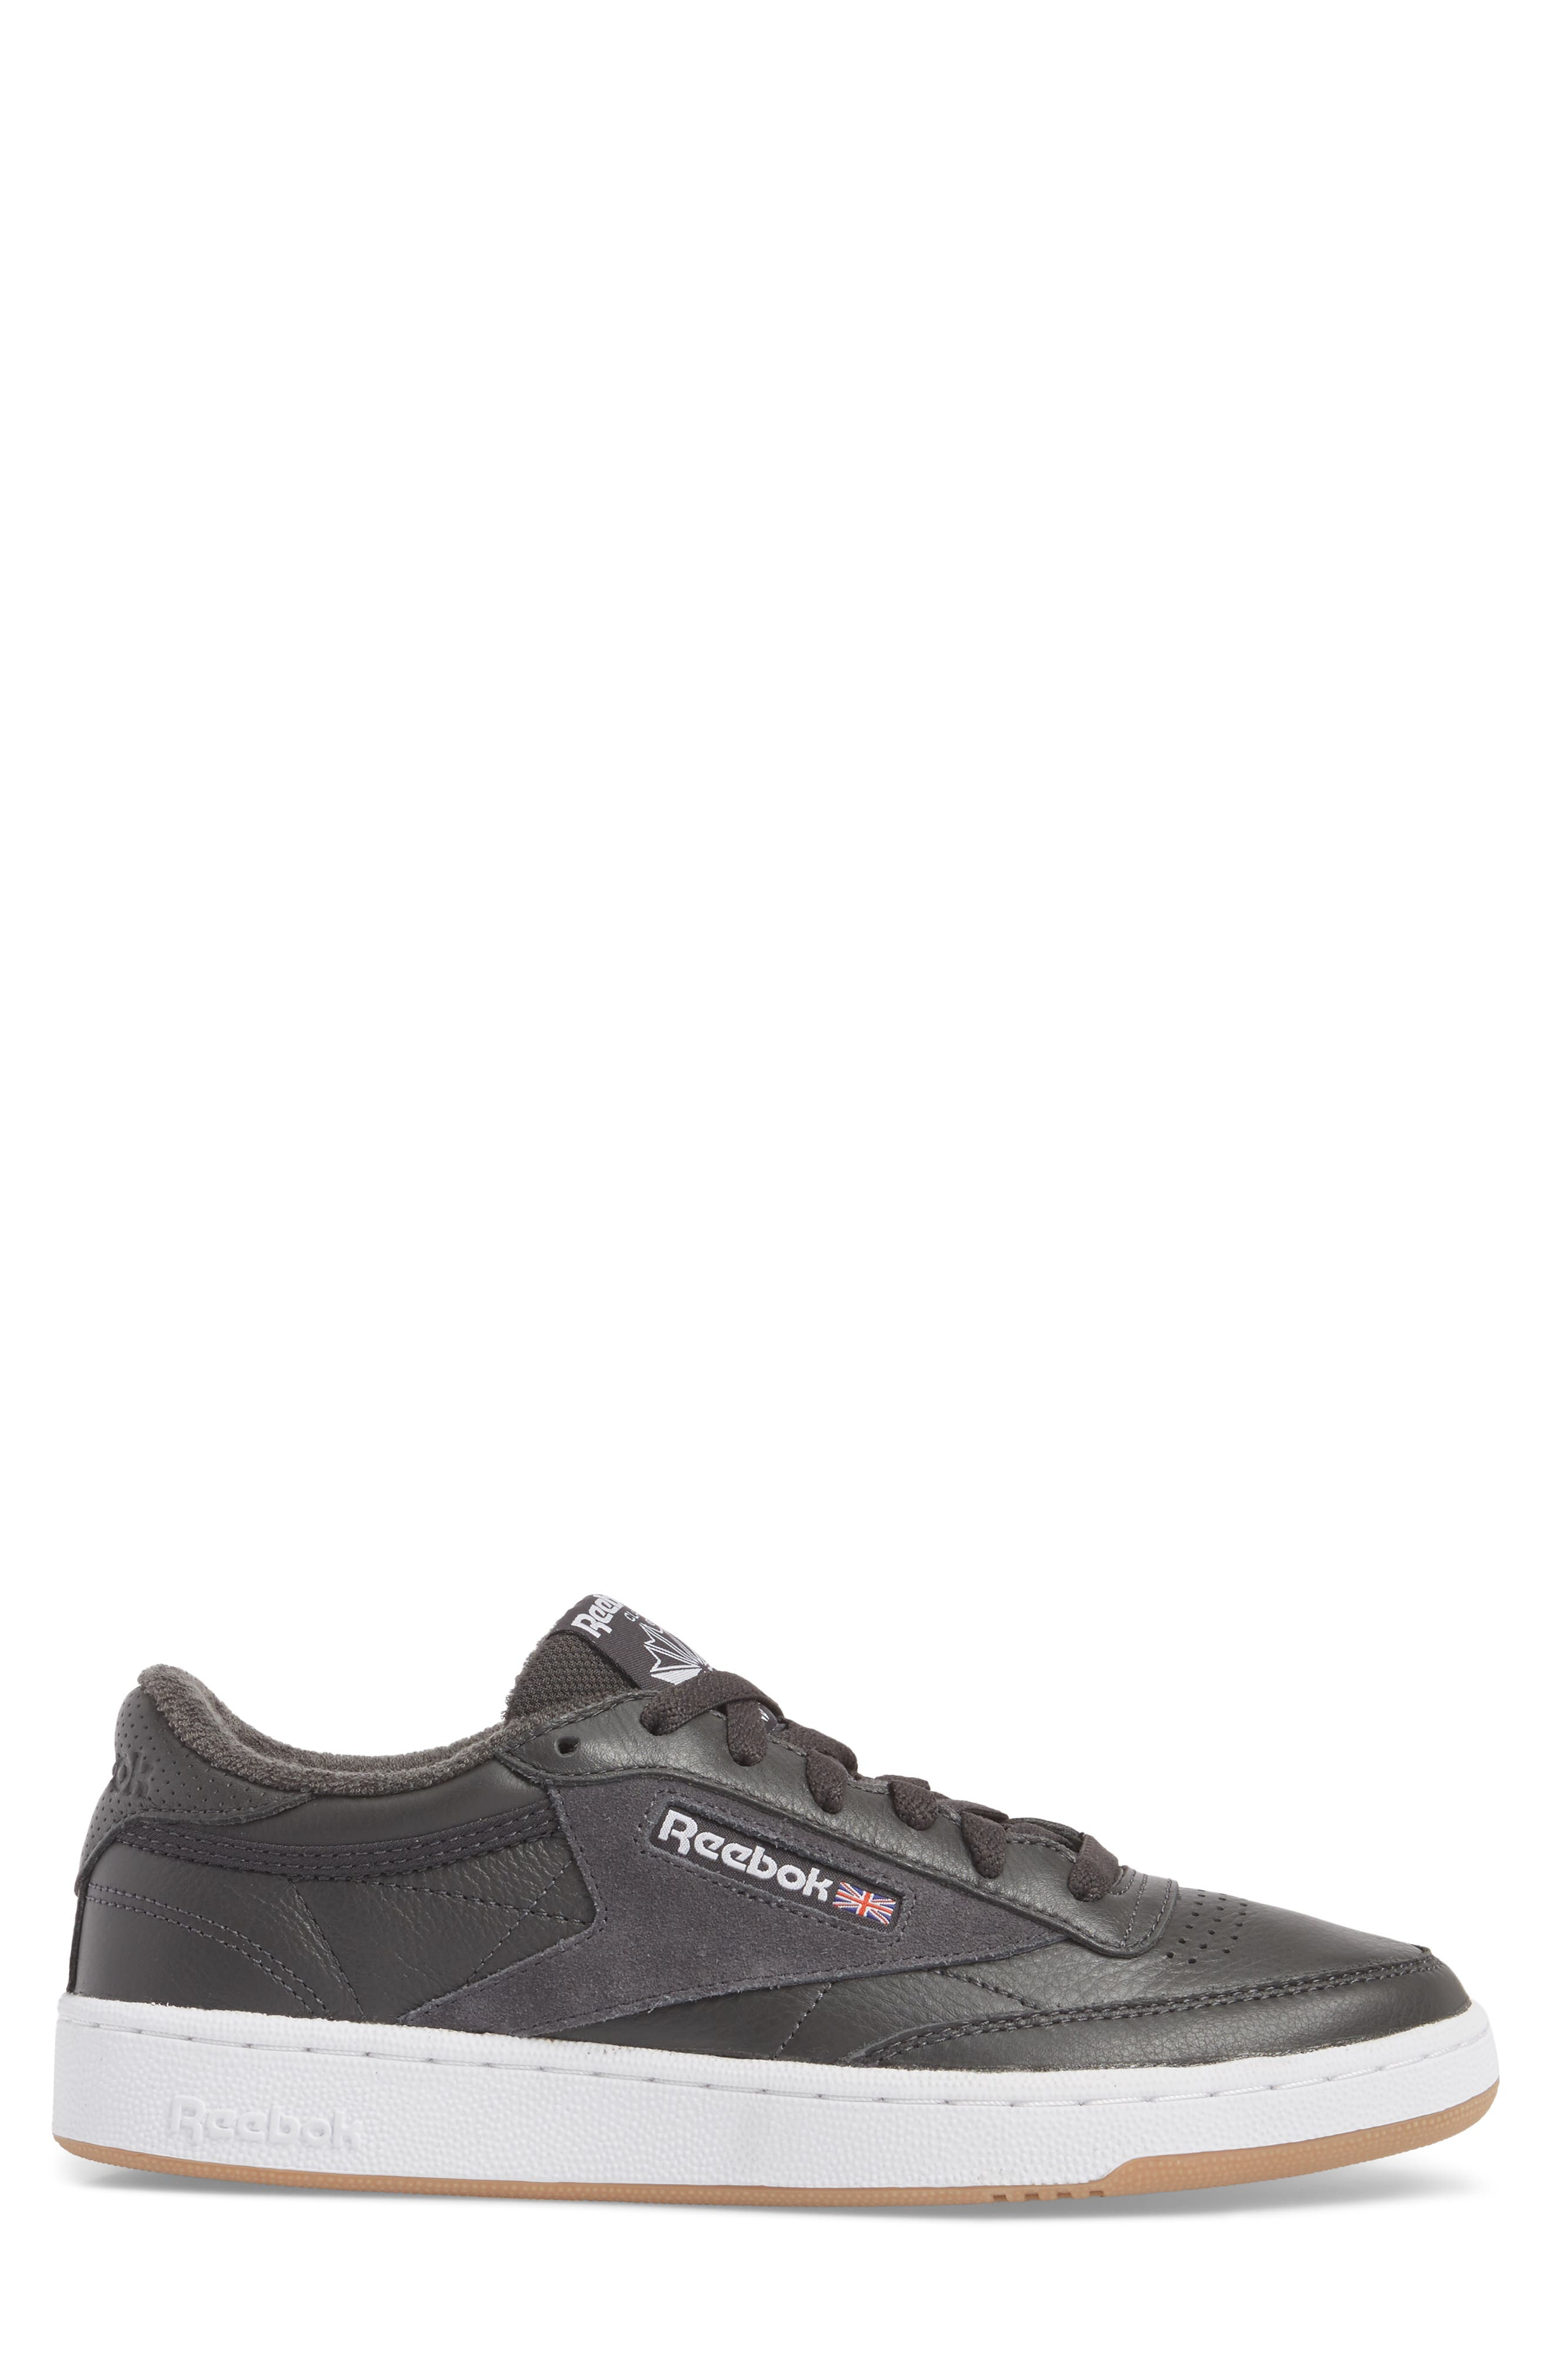 Club C 85 ESTL Sneaker,                             Alternate thumbnail 5, color,